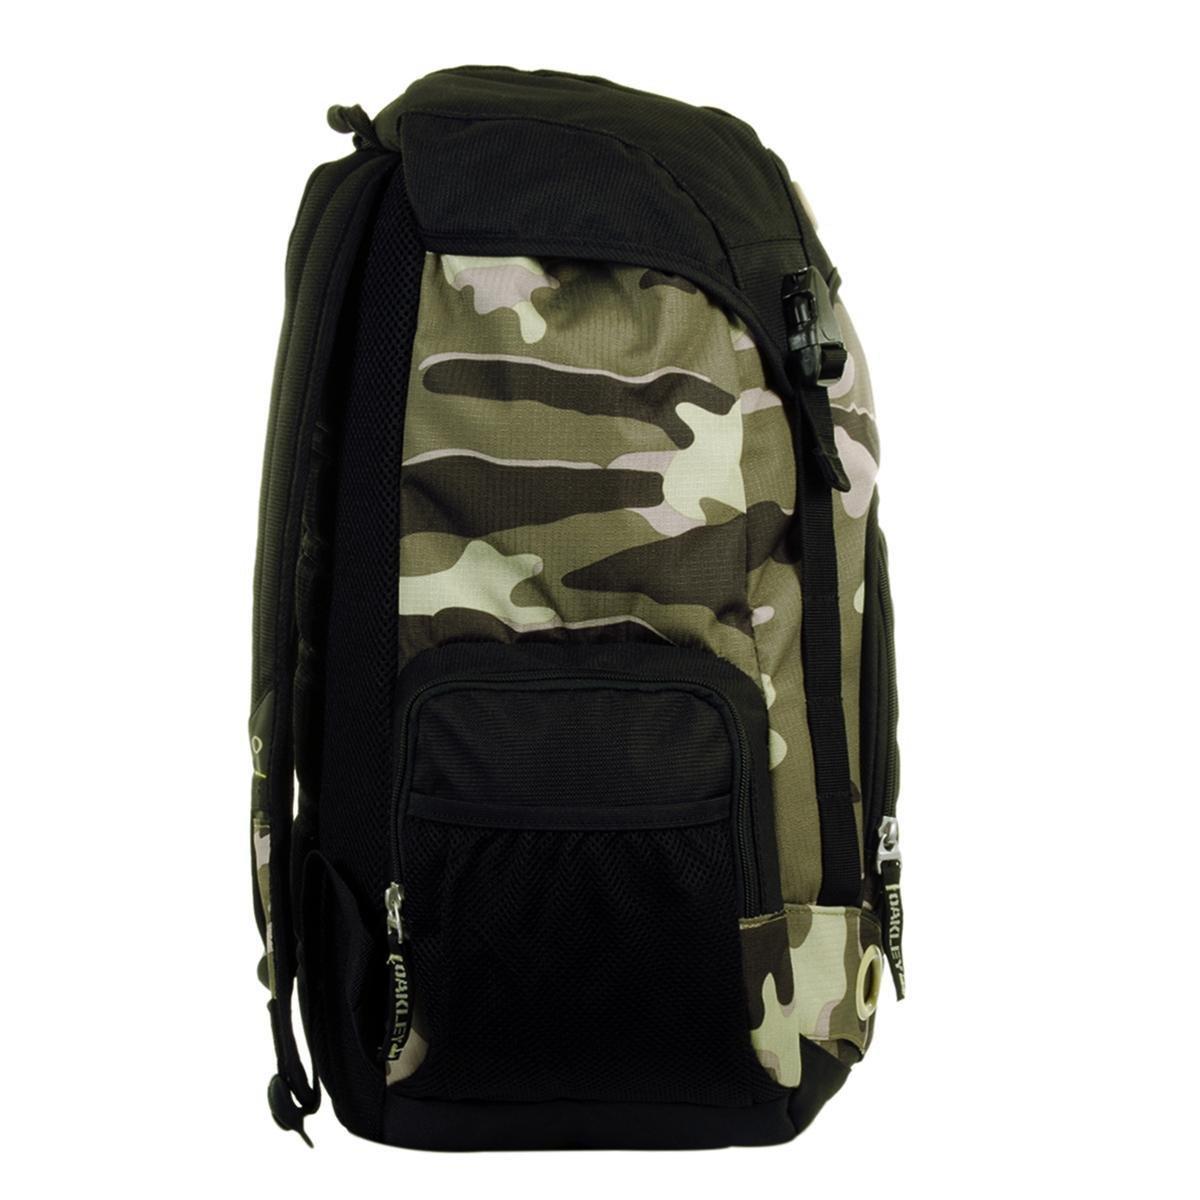 Mochila Oakley Overdrive Pack - Compre Agora   Netshoes 5fac959673